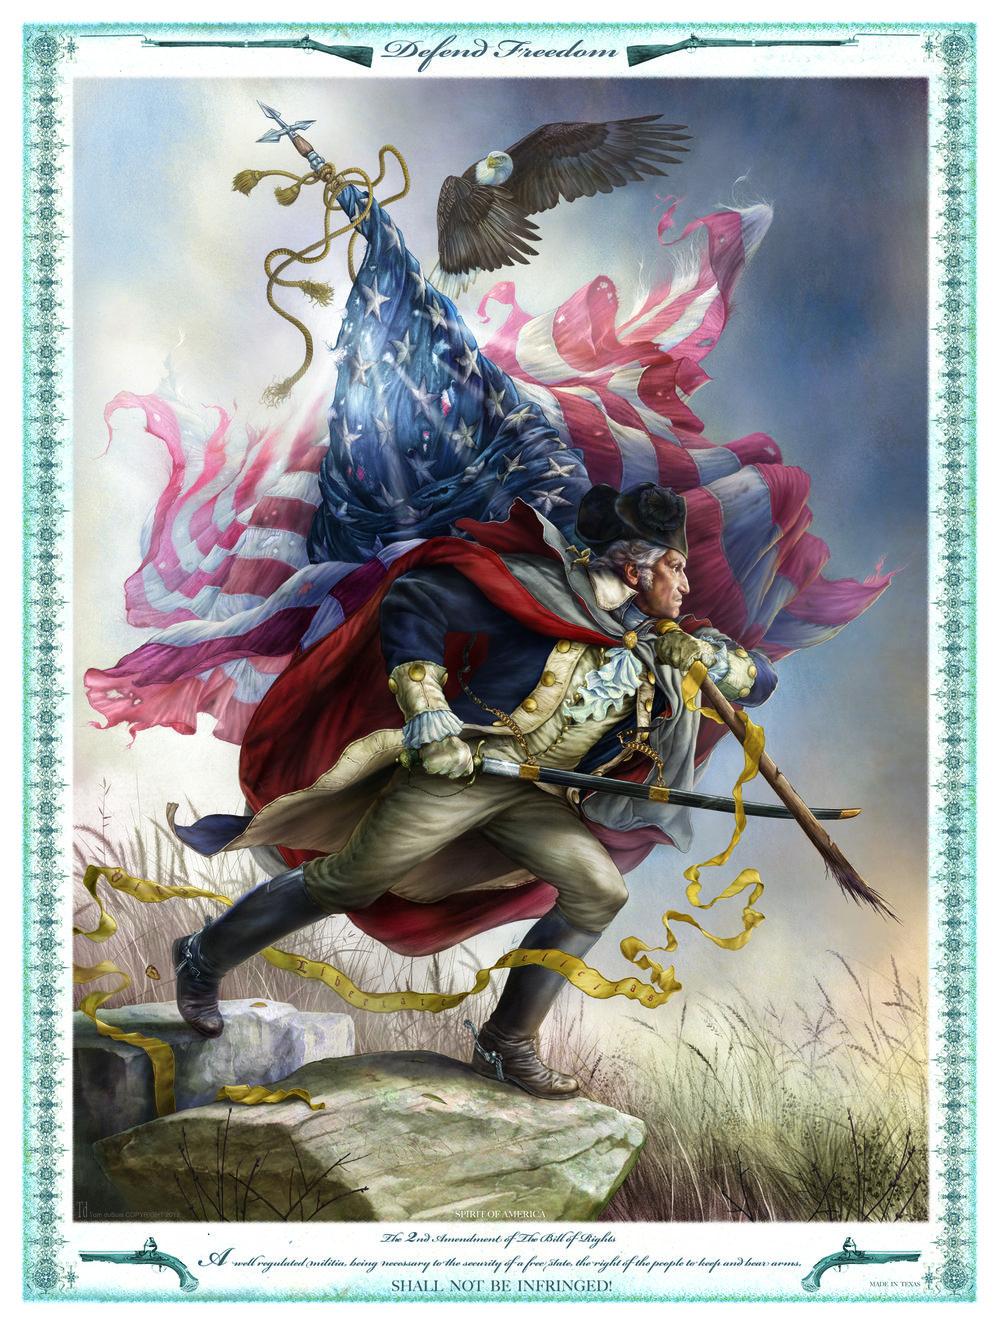 Spirit of America 21.5x28.5.jpg